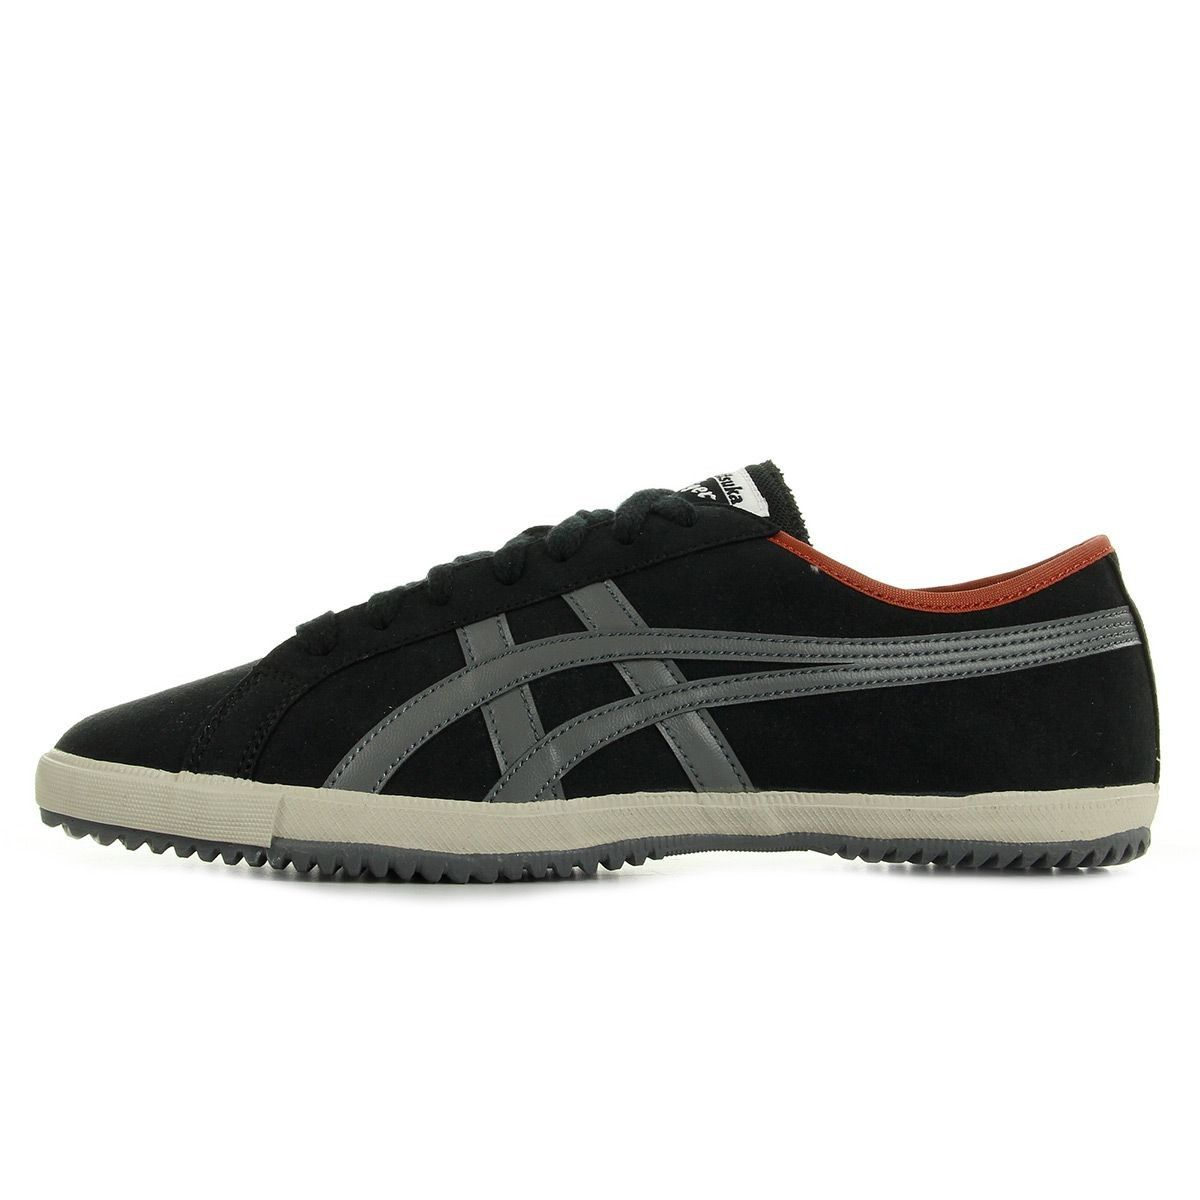 chaussure running homme gel glide noire asics